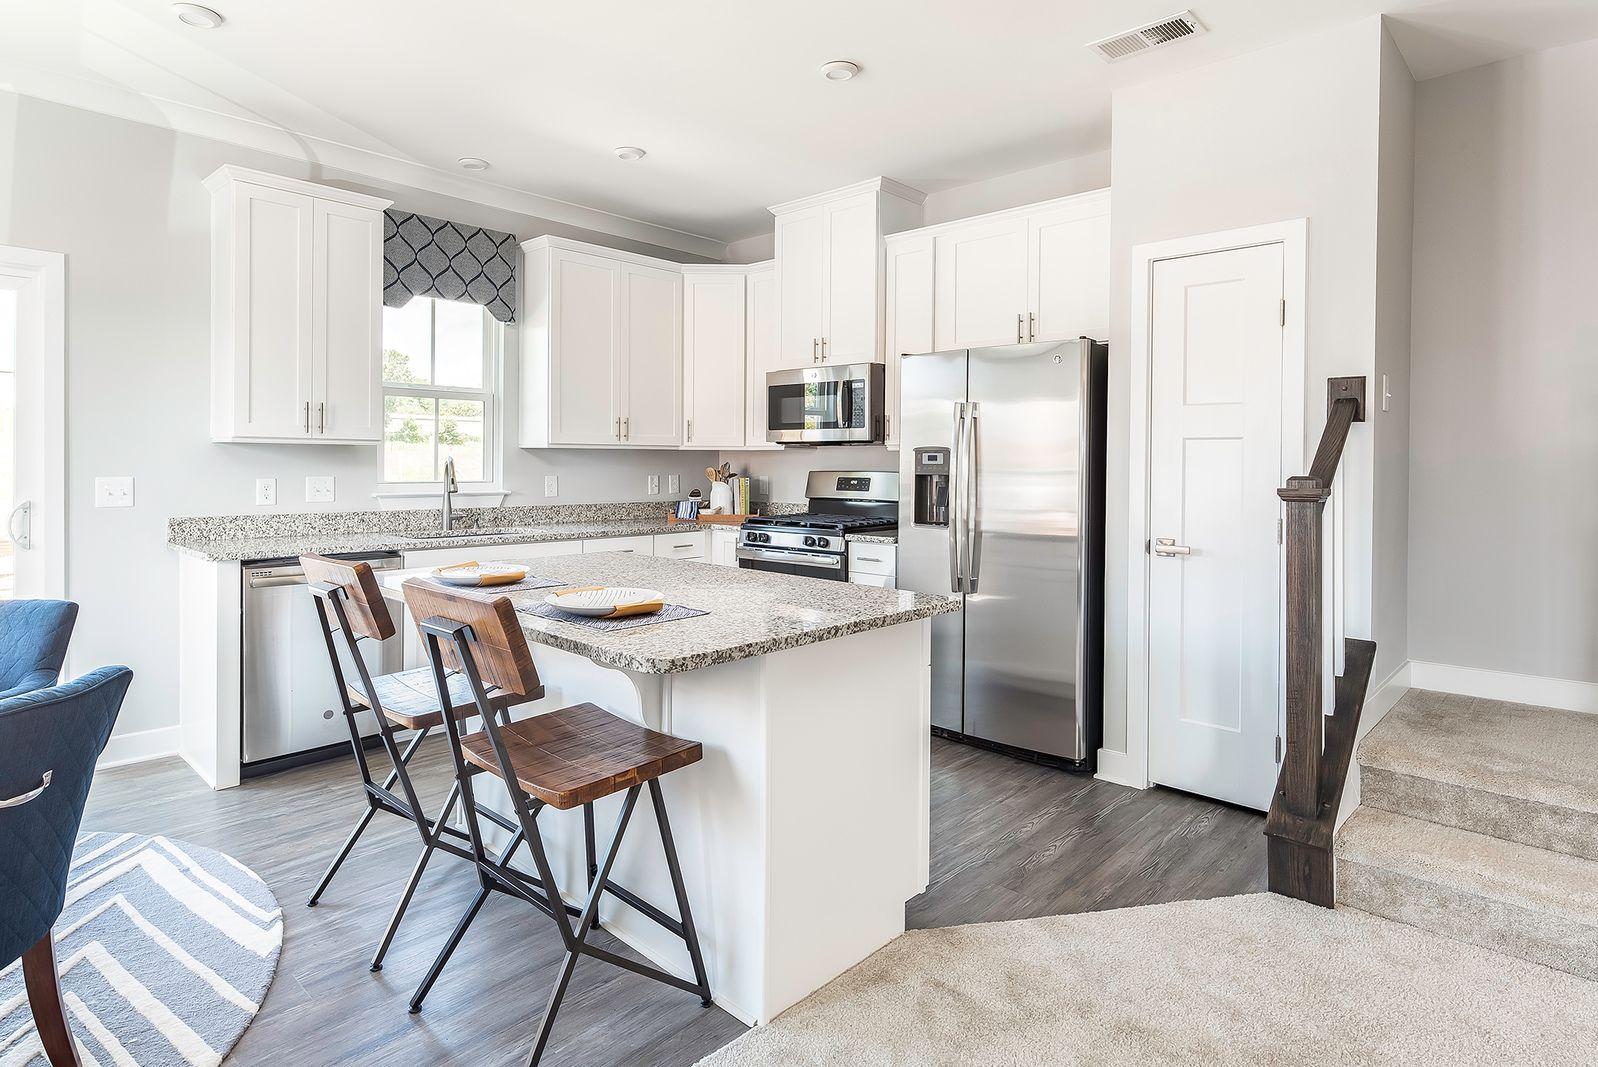 Kitchen featured in the Odessa By Ryan Homes in Greenville-Spartanburg, SC